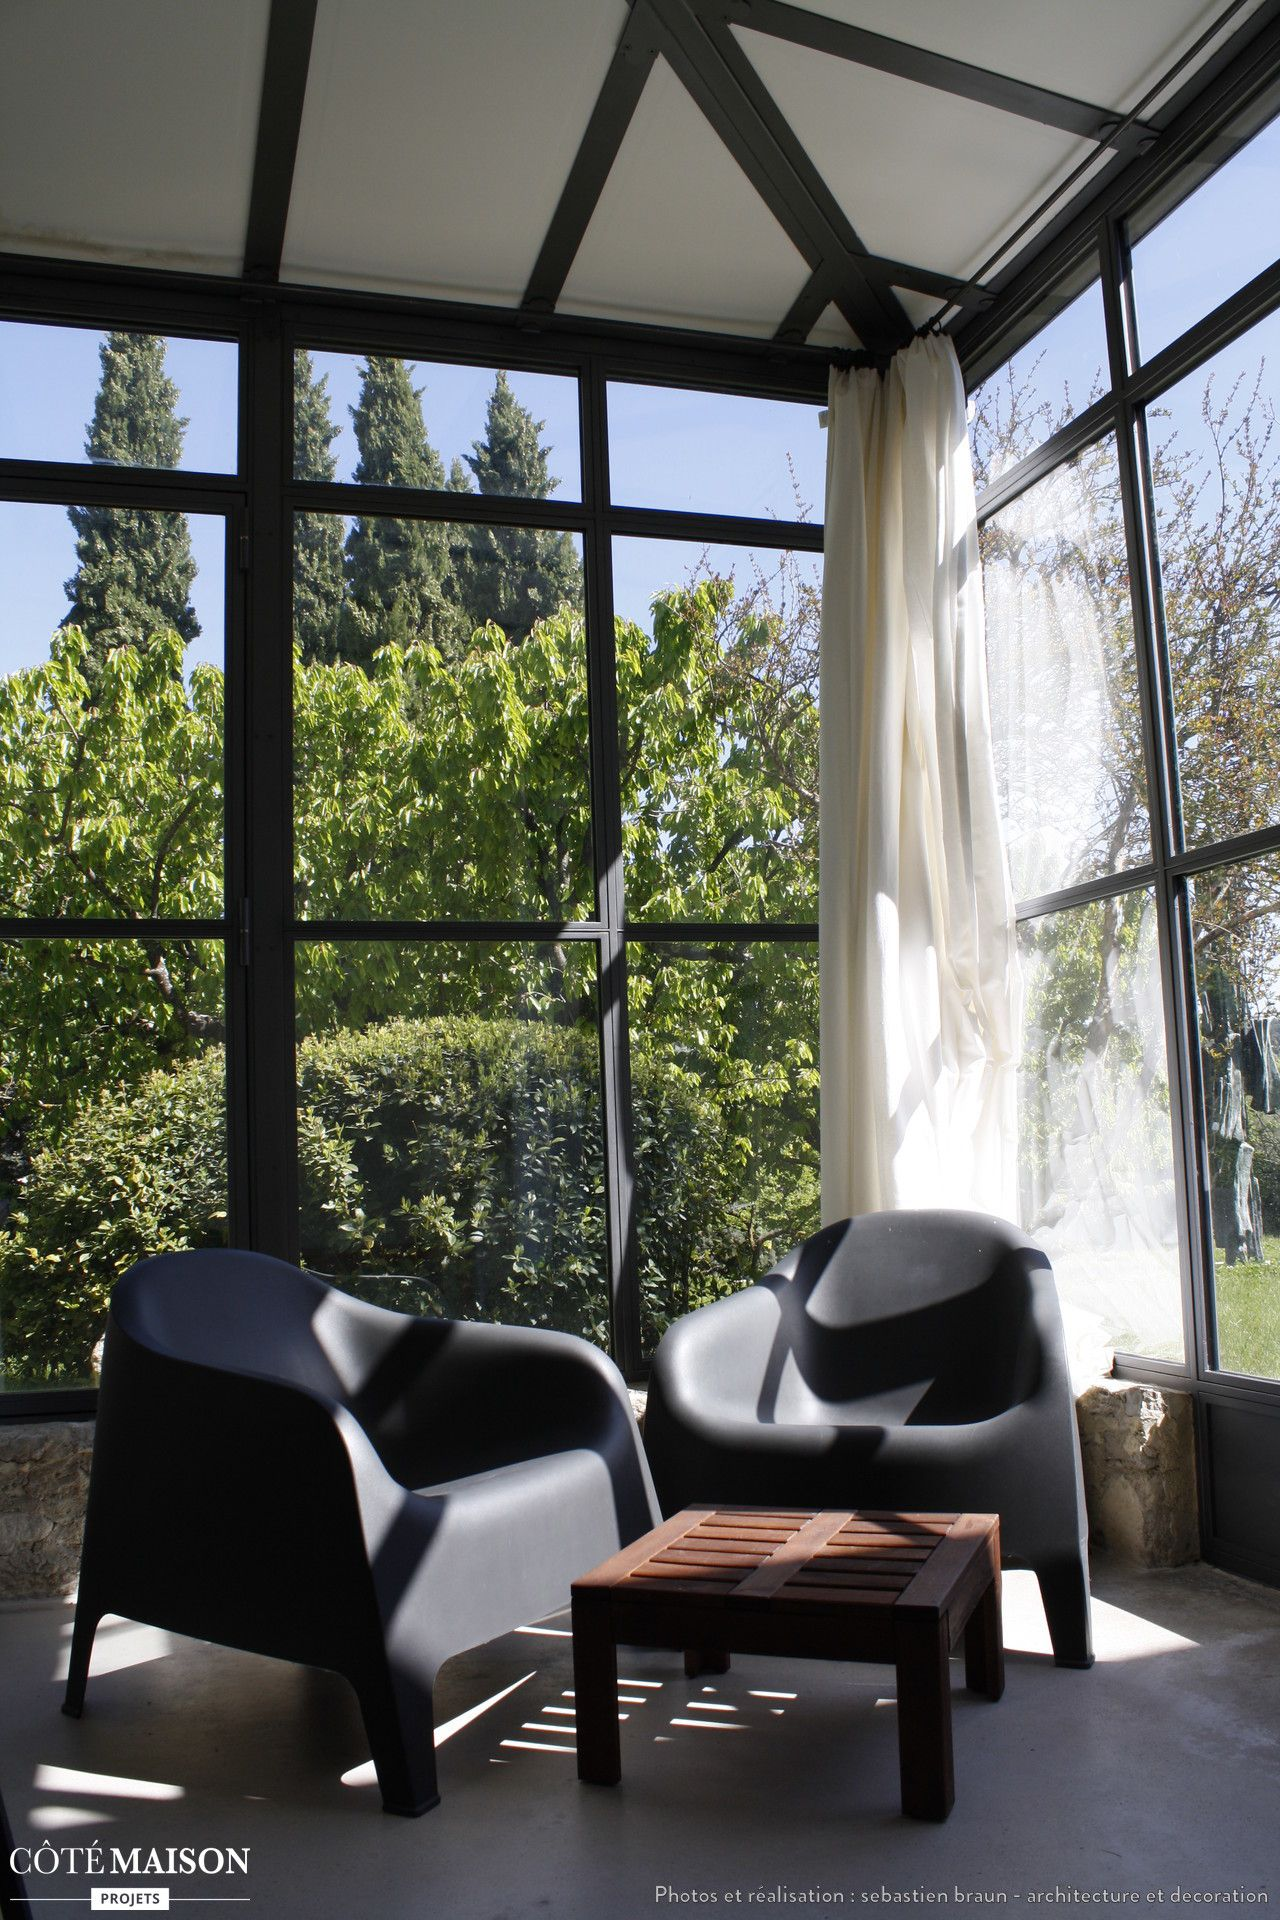 Une veranda au meubles design v randa et verri re pinterest v randas meuble design et meubles for Meuble veranda